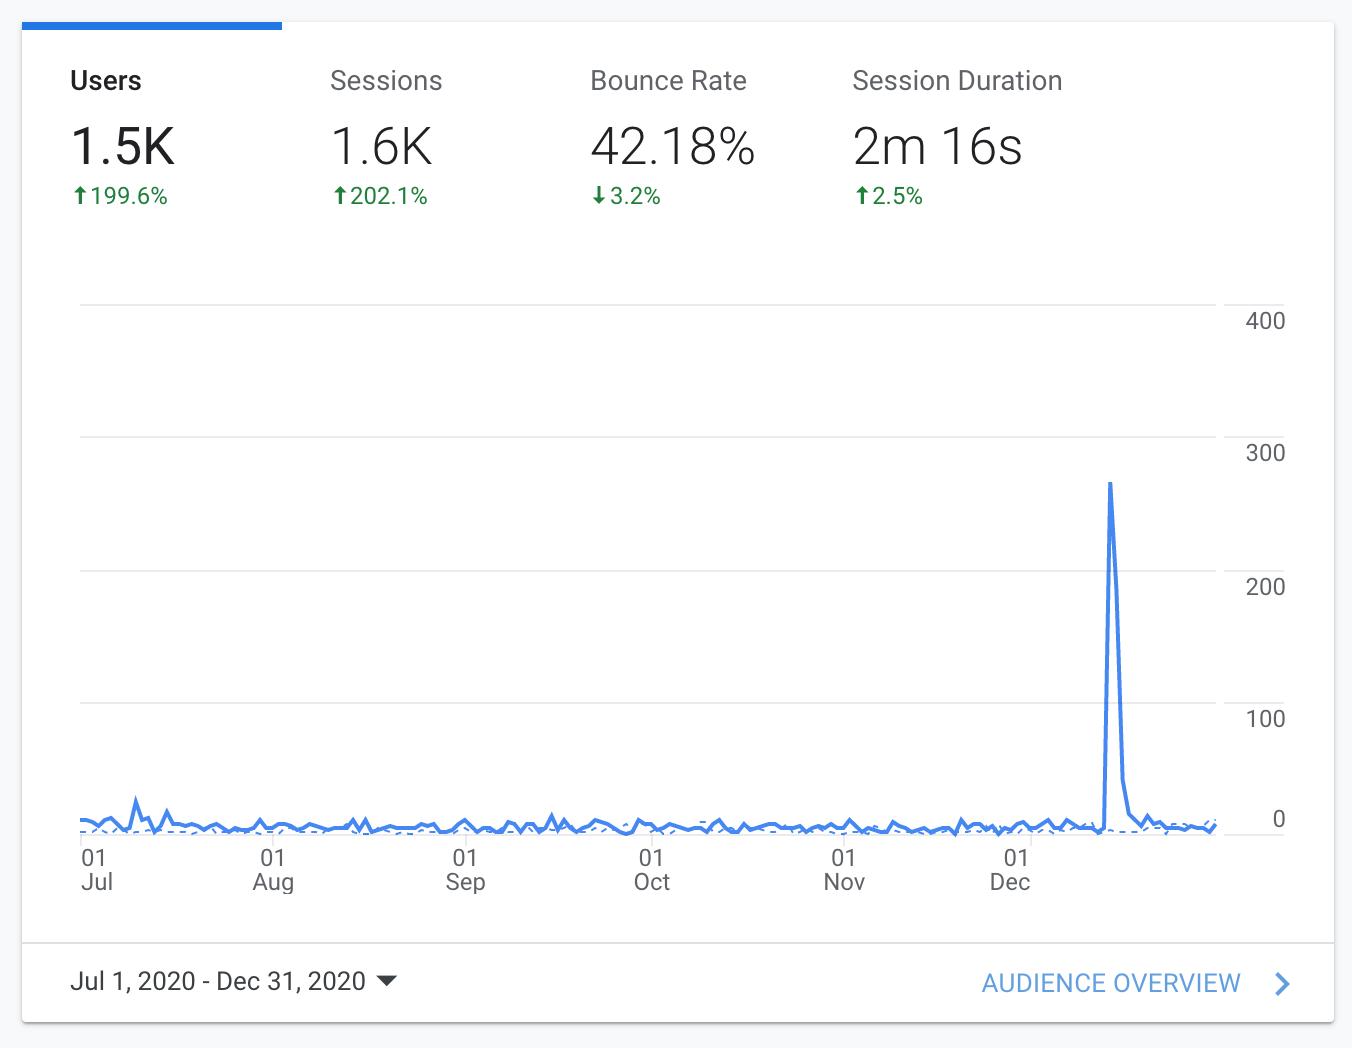 Digital marketing agency analytics results for Philip Perez Law